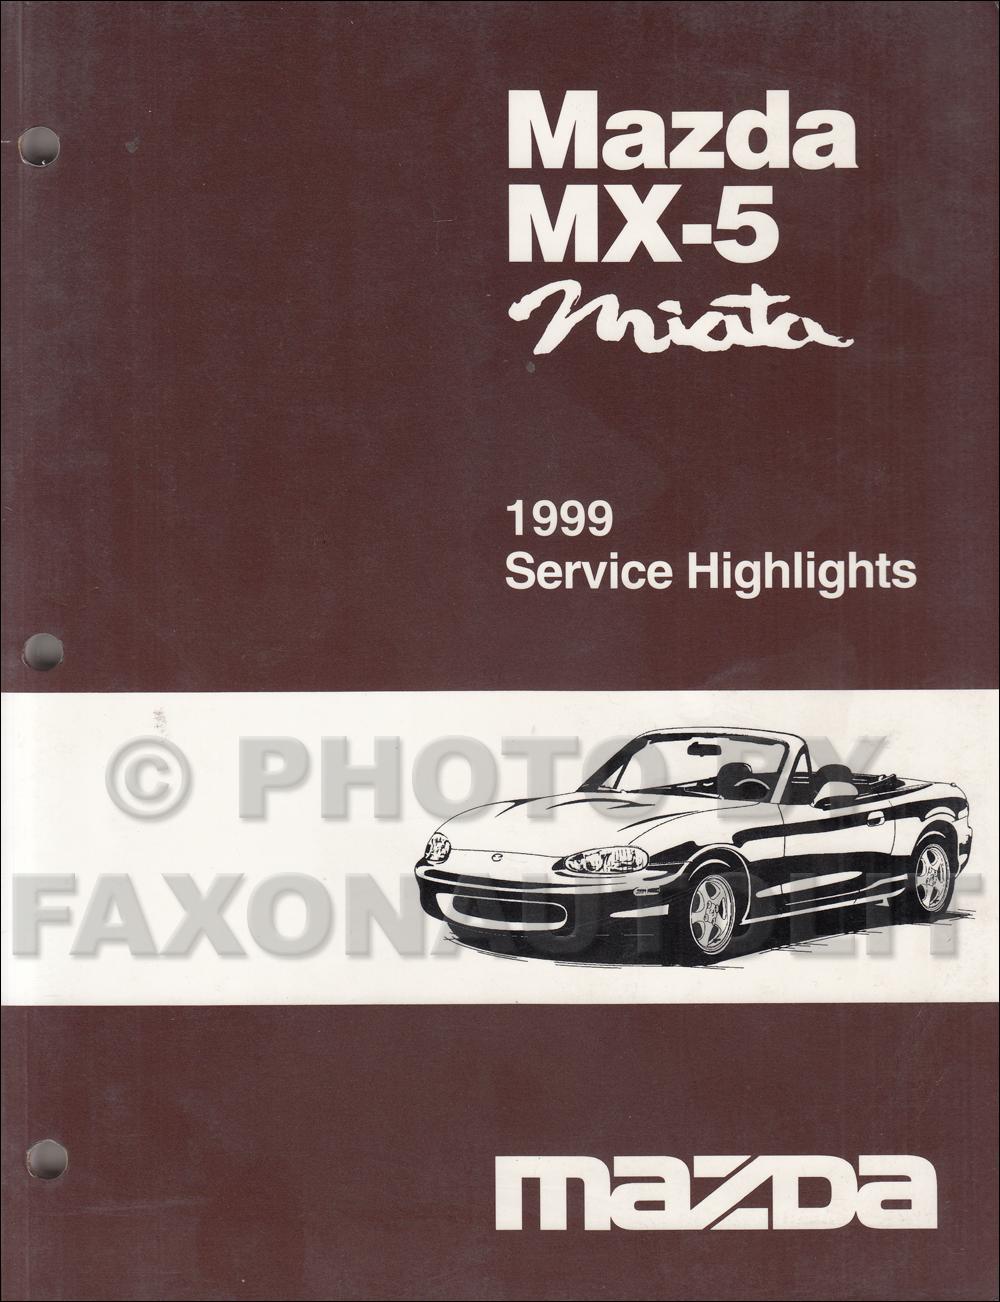 hight resolution of 1999 mazda mx 5 miata service highlights original service training manual mx5